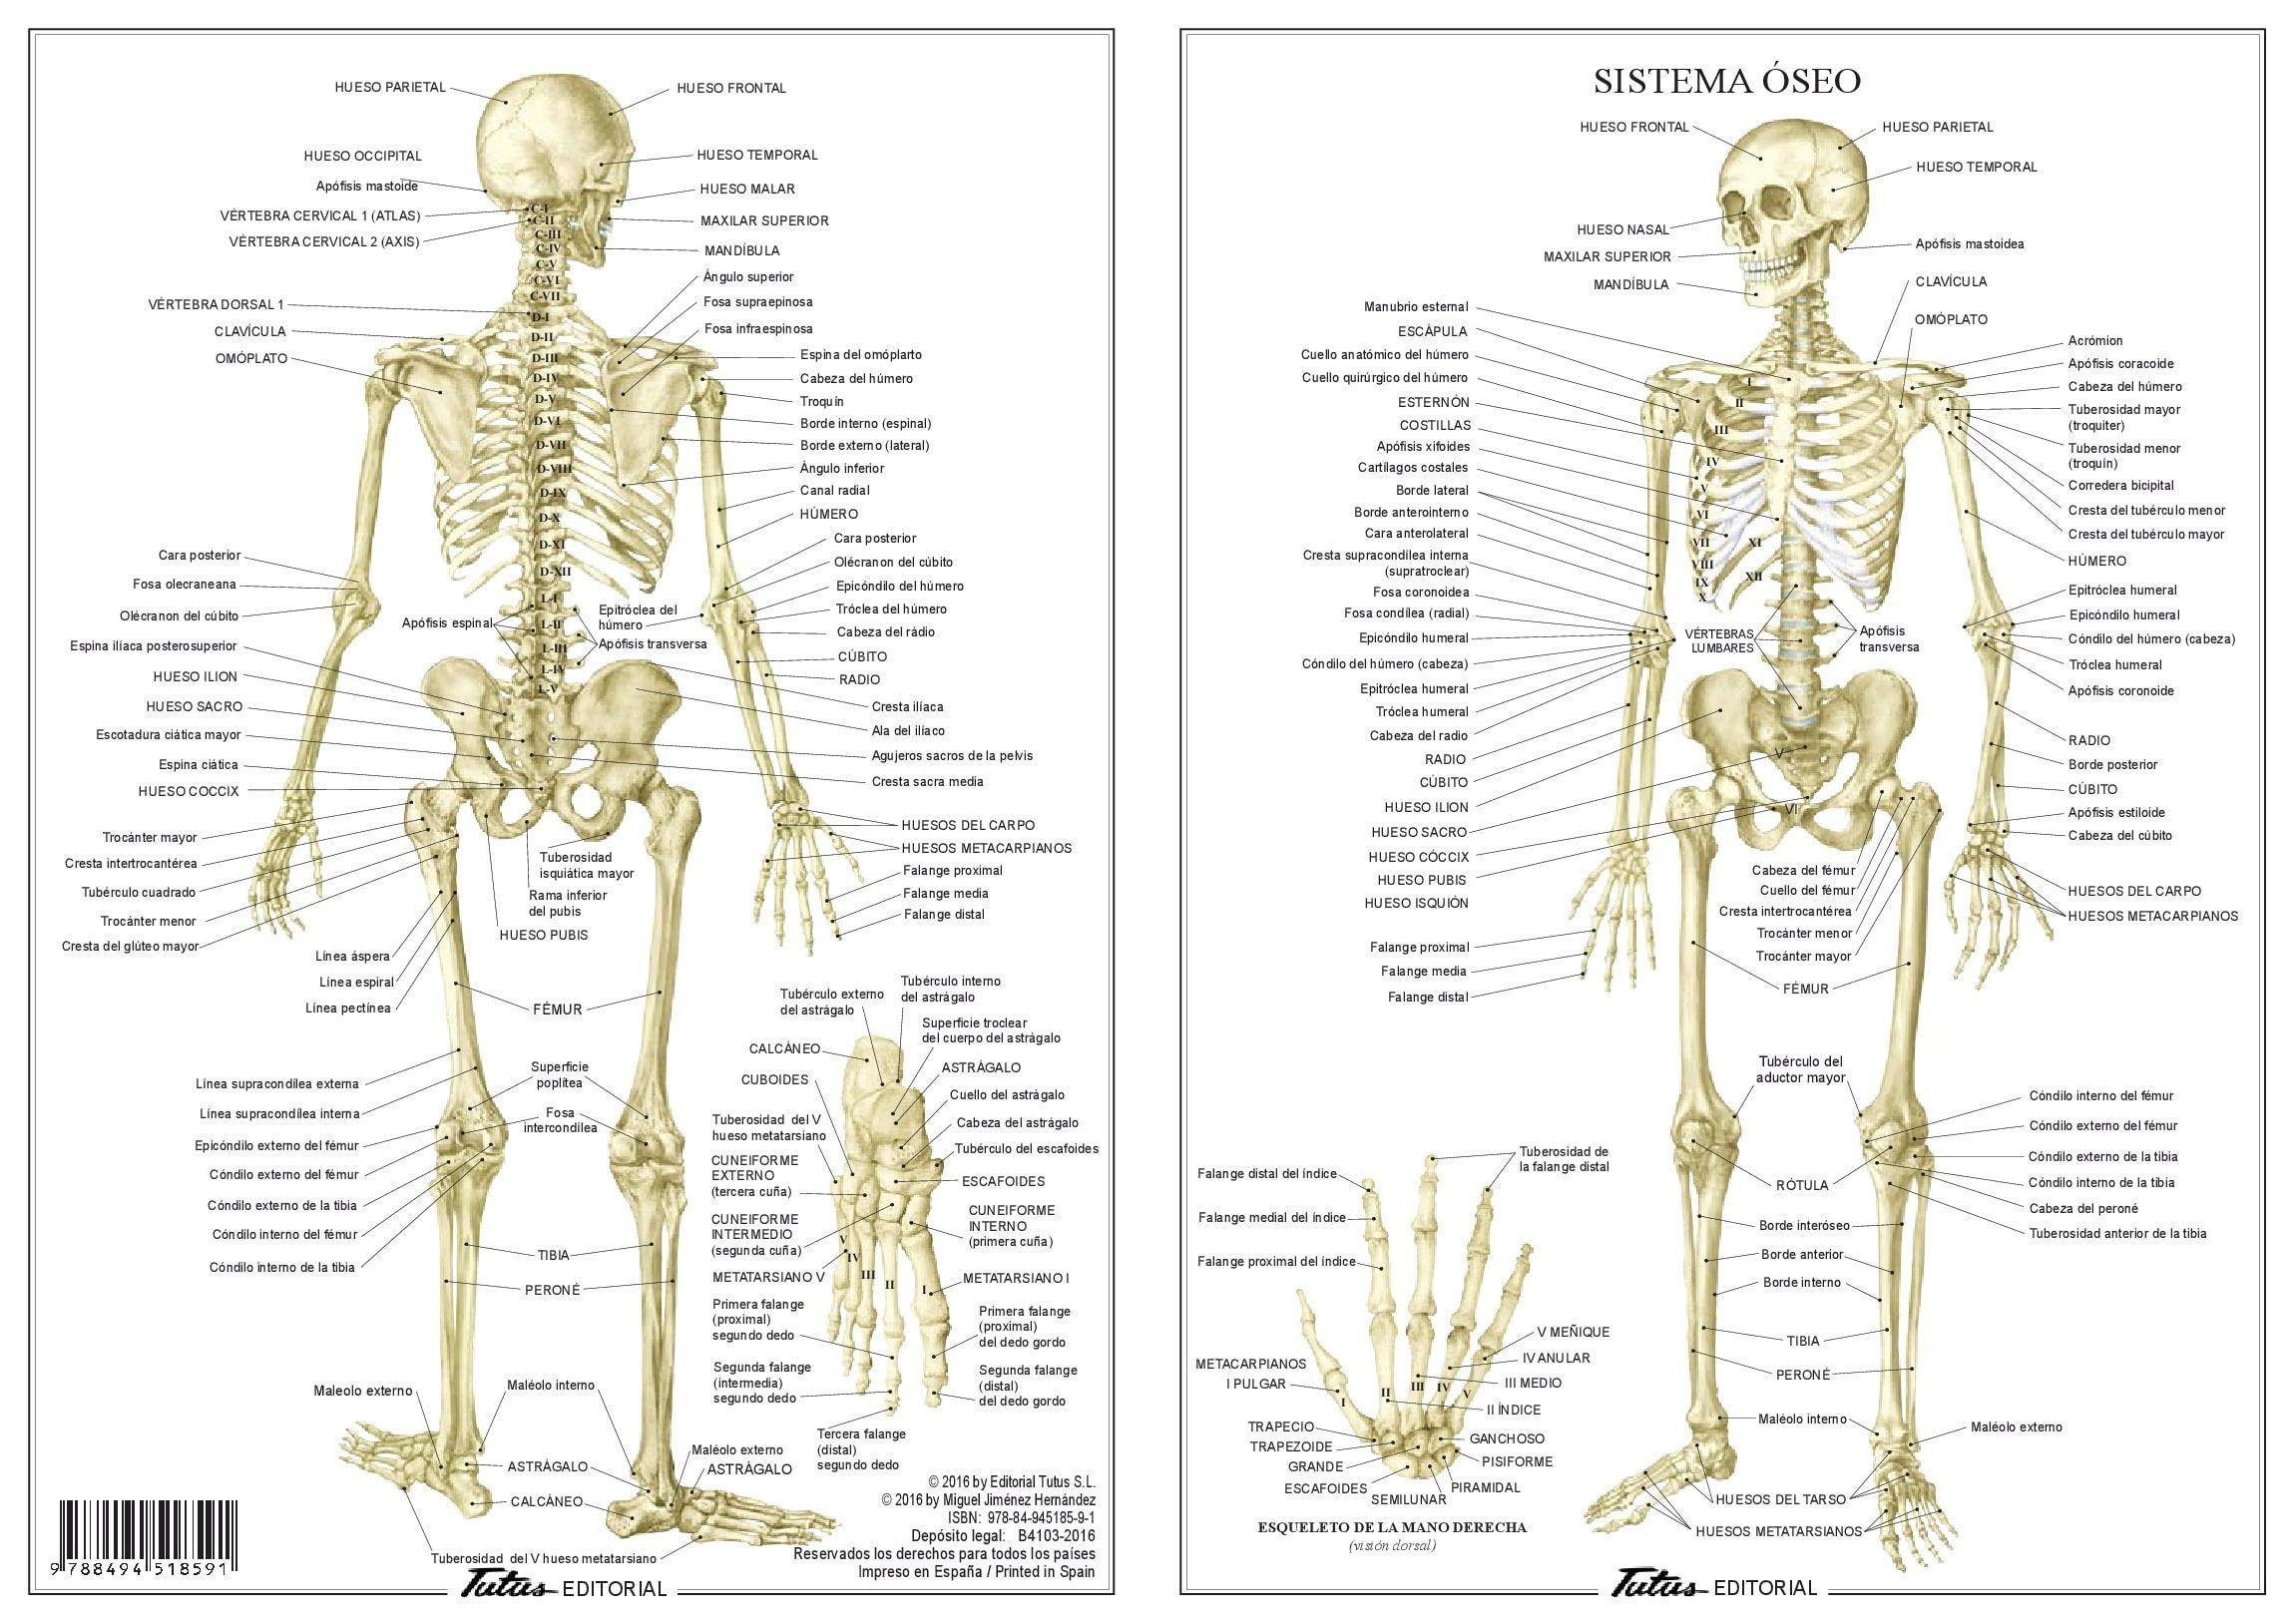 Groß Supra Block Anatomie Fotos - Anatomie Ideen - finotti.info